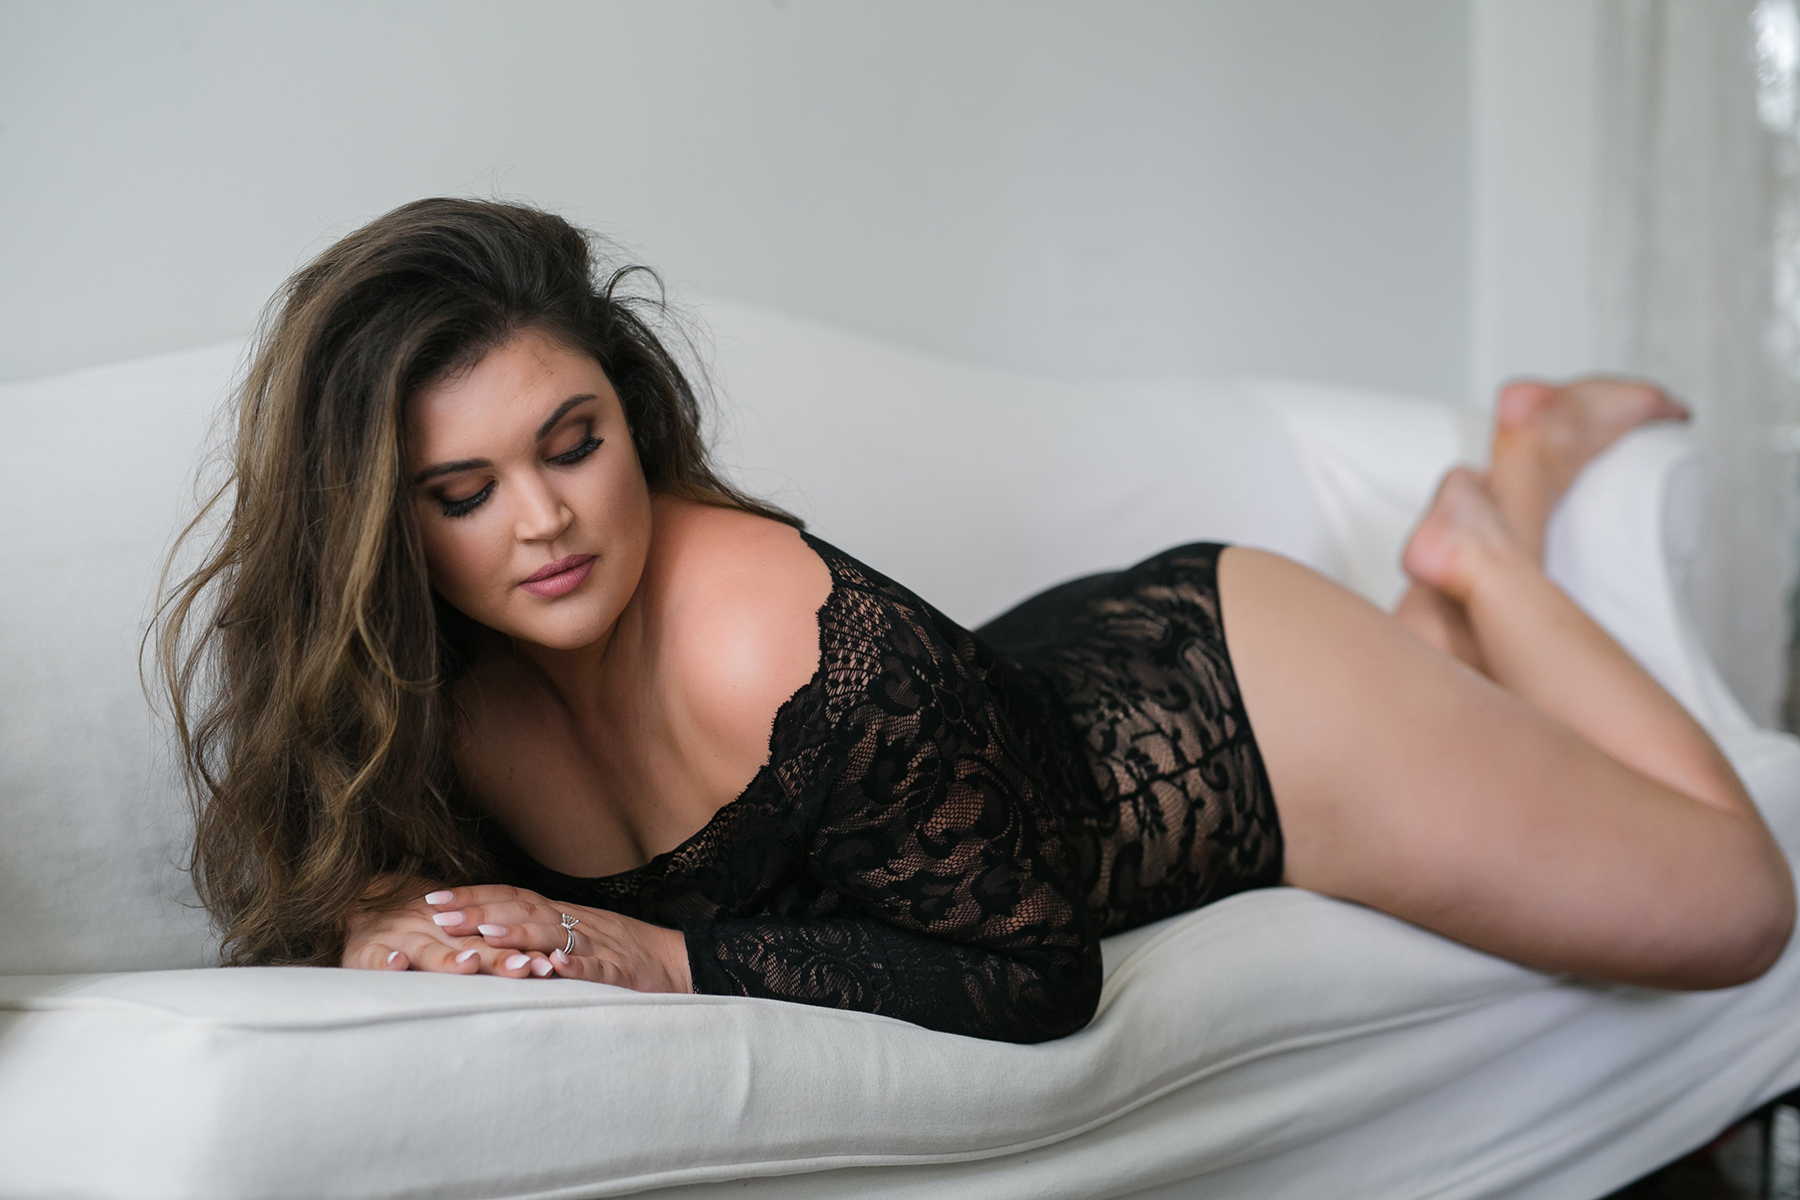 austin-tx-boudoir-photographer-photography-kimberly-brooke-16.jpg